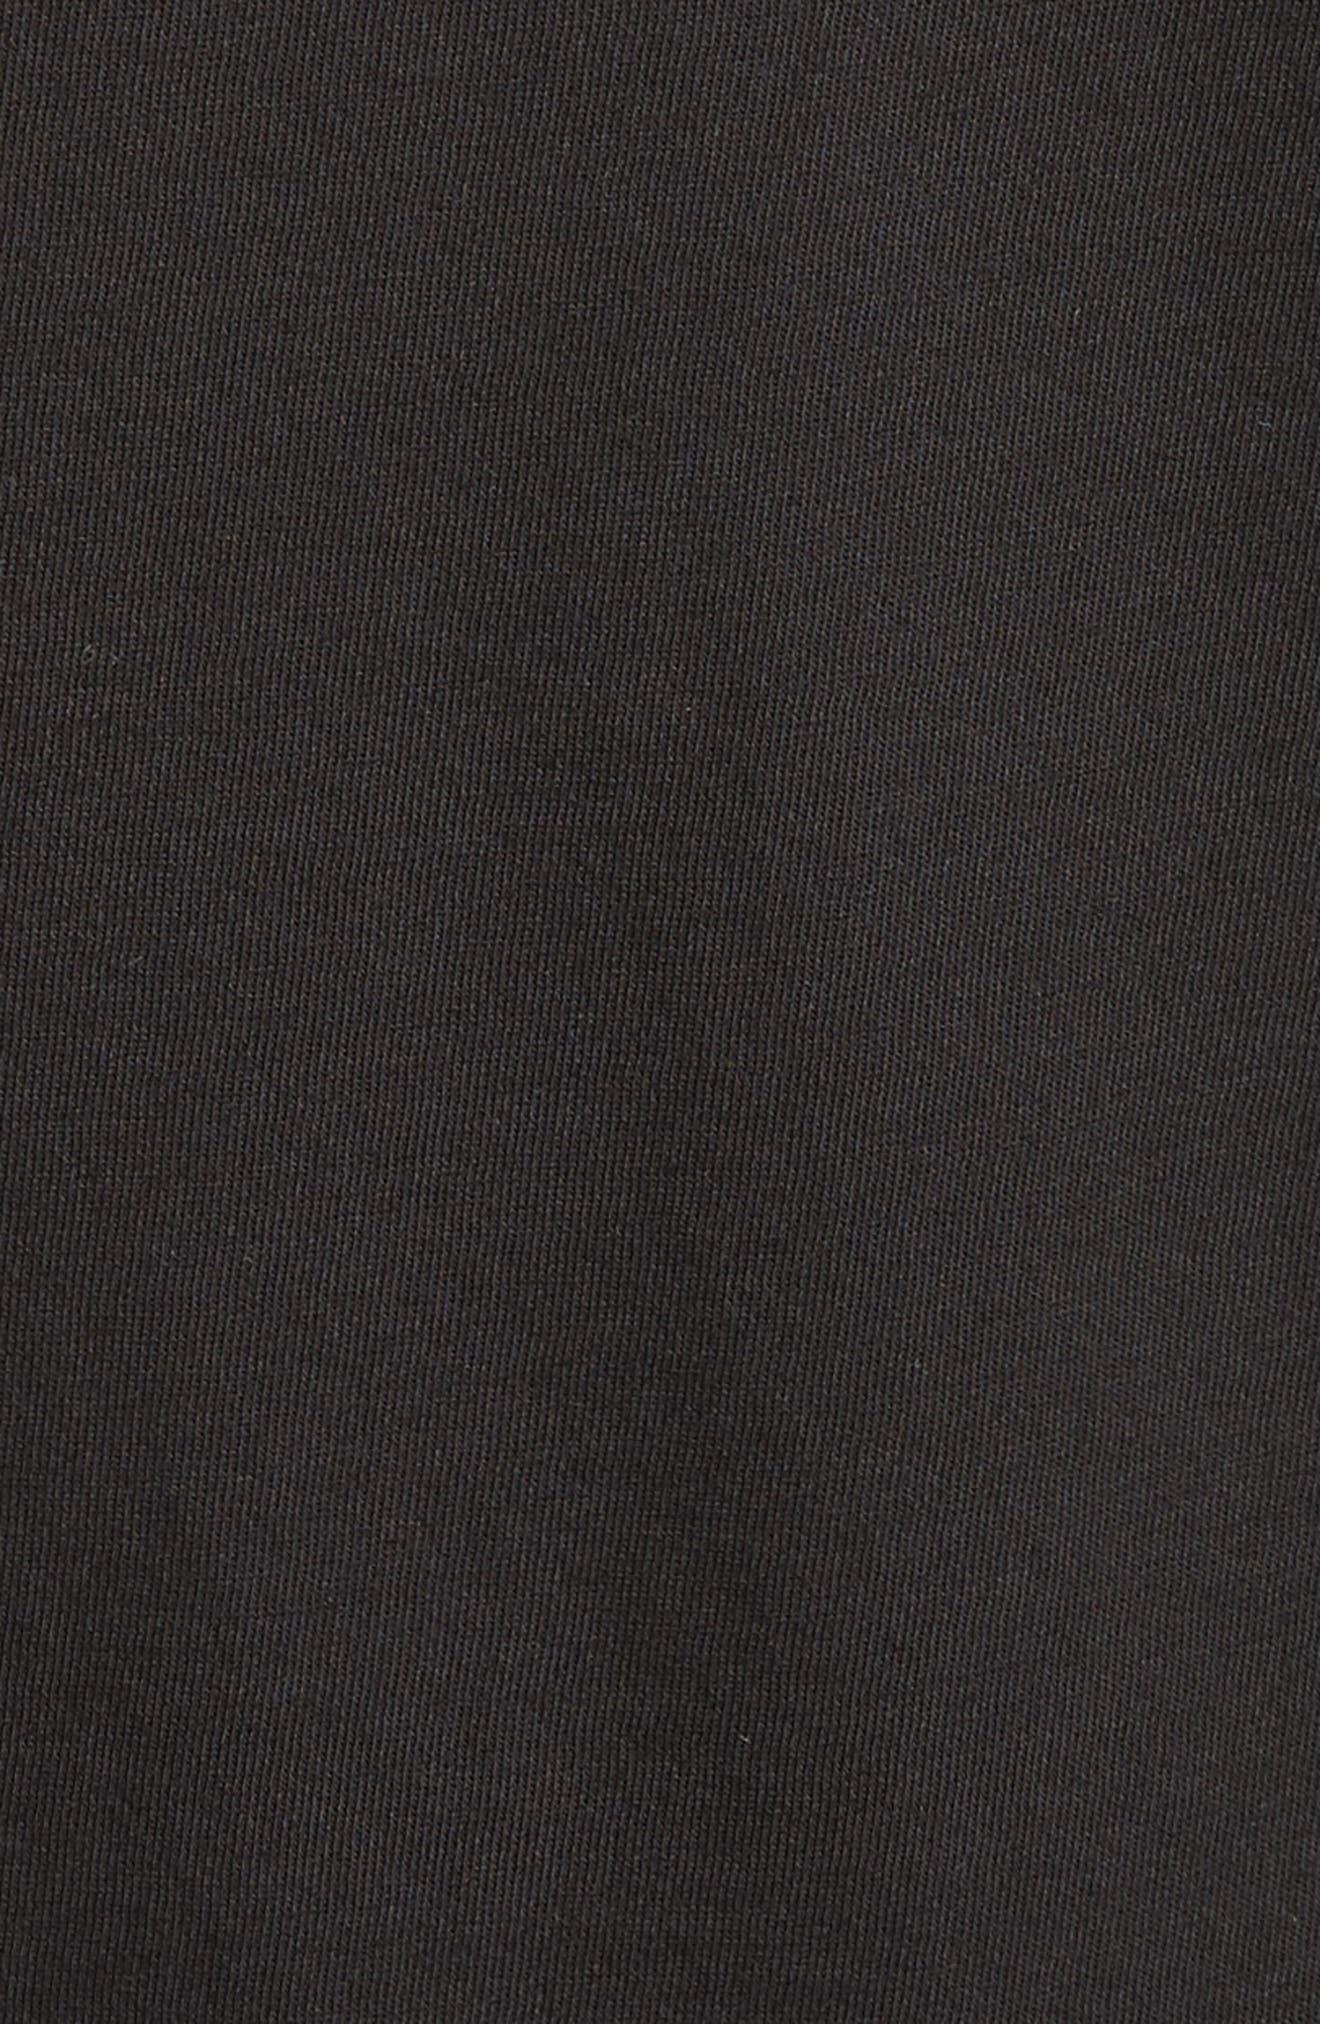 ADAM LIPPES, Crewneck Tee, Alternate thumbnail 5, color, BLACK